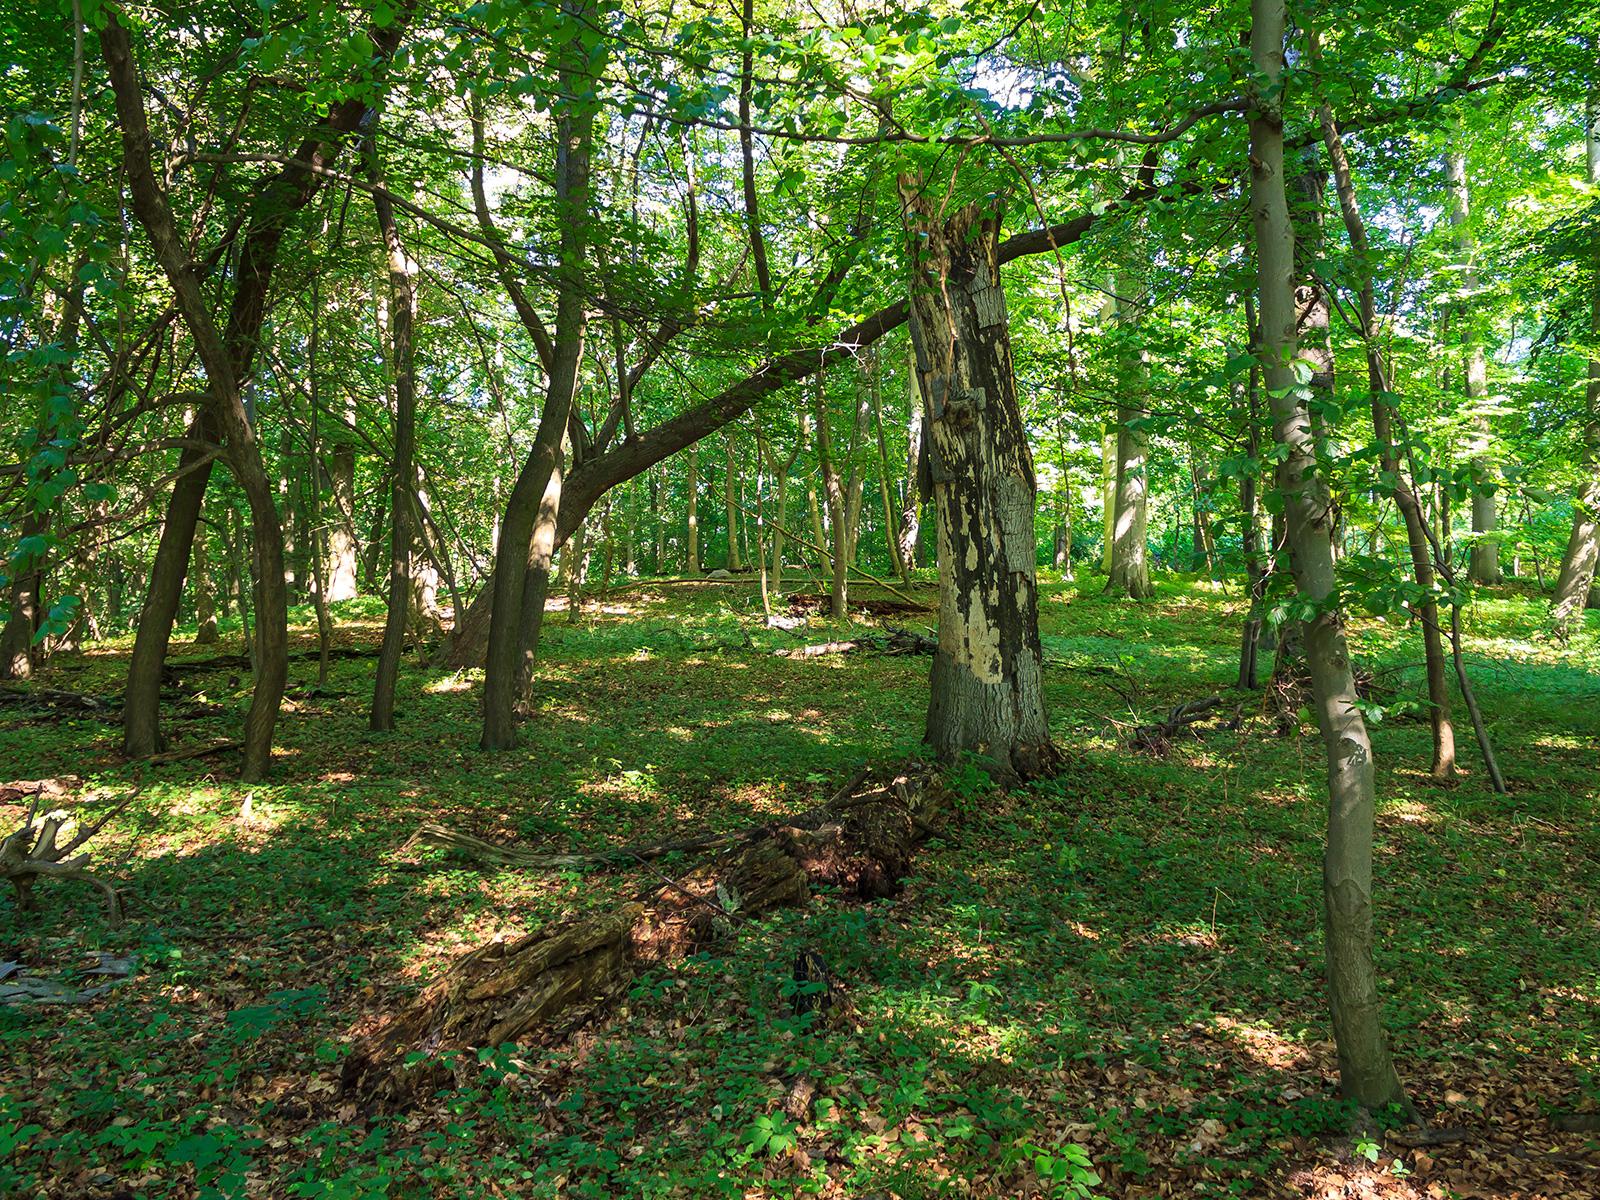 starkes stehendes Totholz und stark zersetztes liegendes Totholz